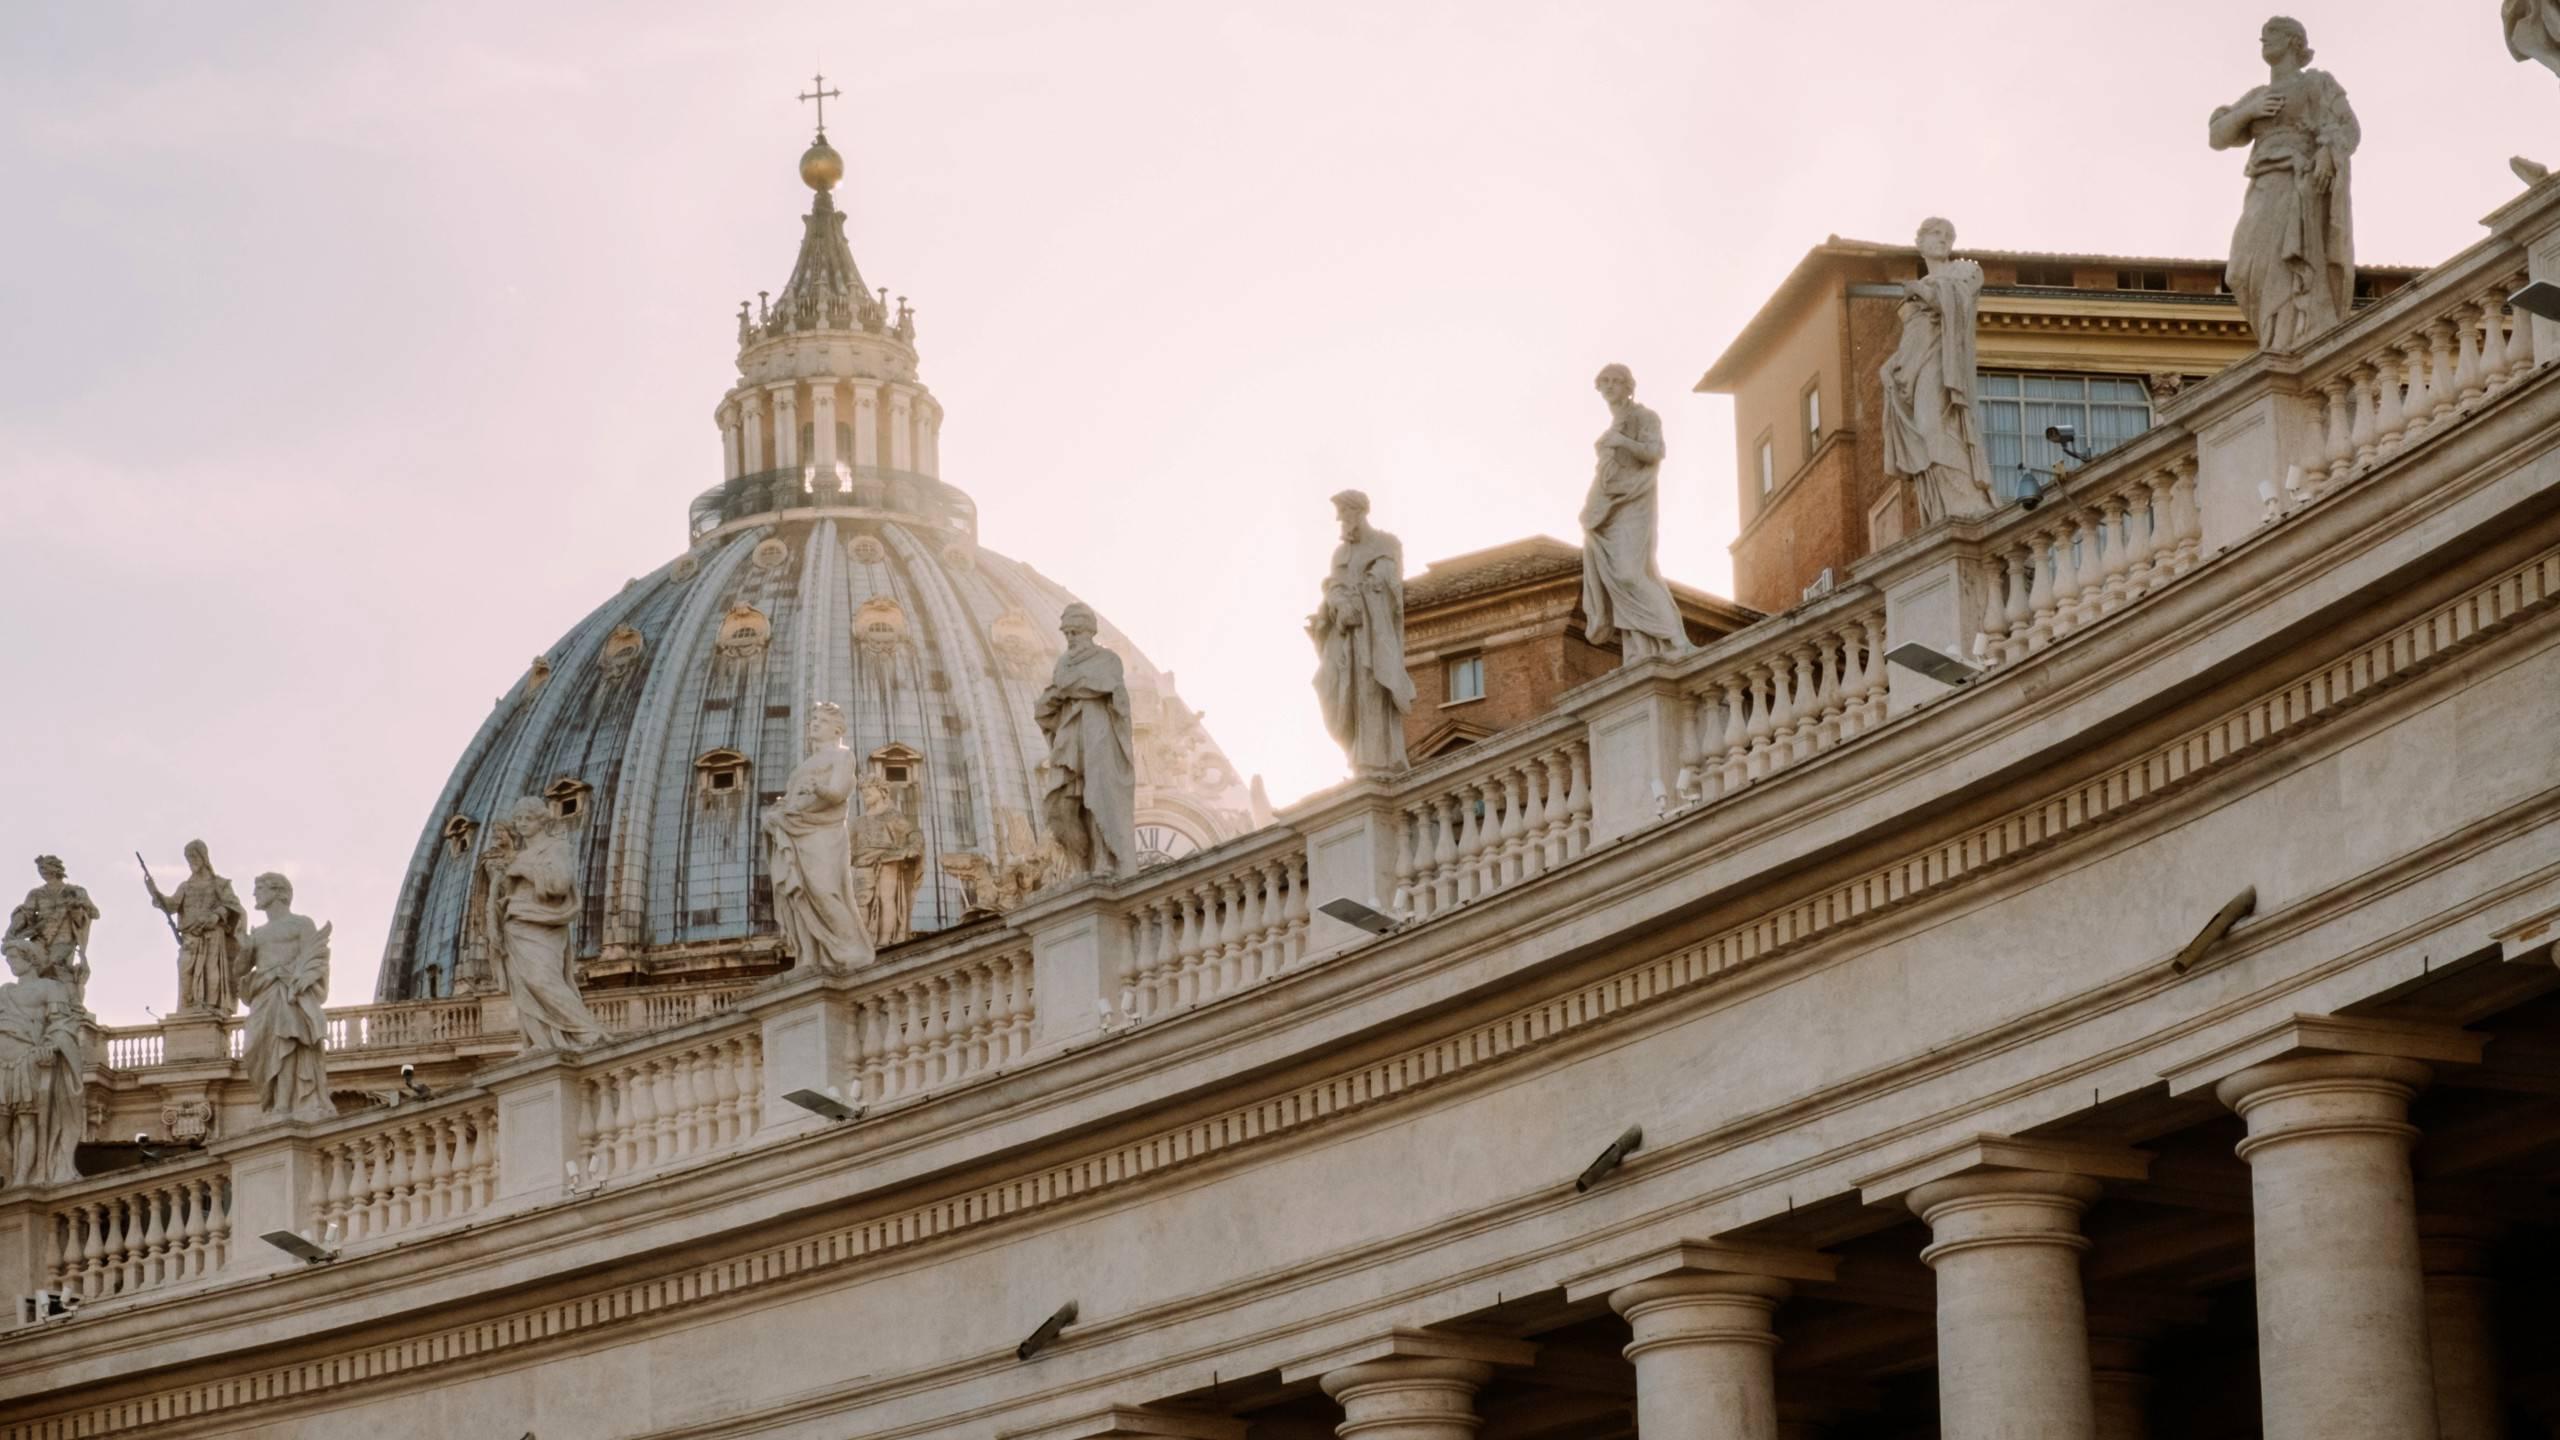 hotel-alessandrino-roma-basilica-de-San-Pedro-simone-savoldi-620408-unsplash